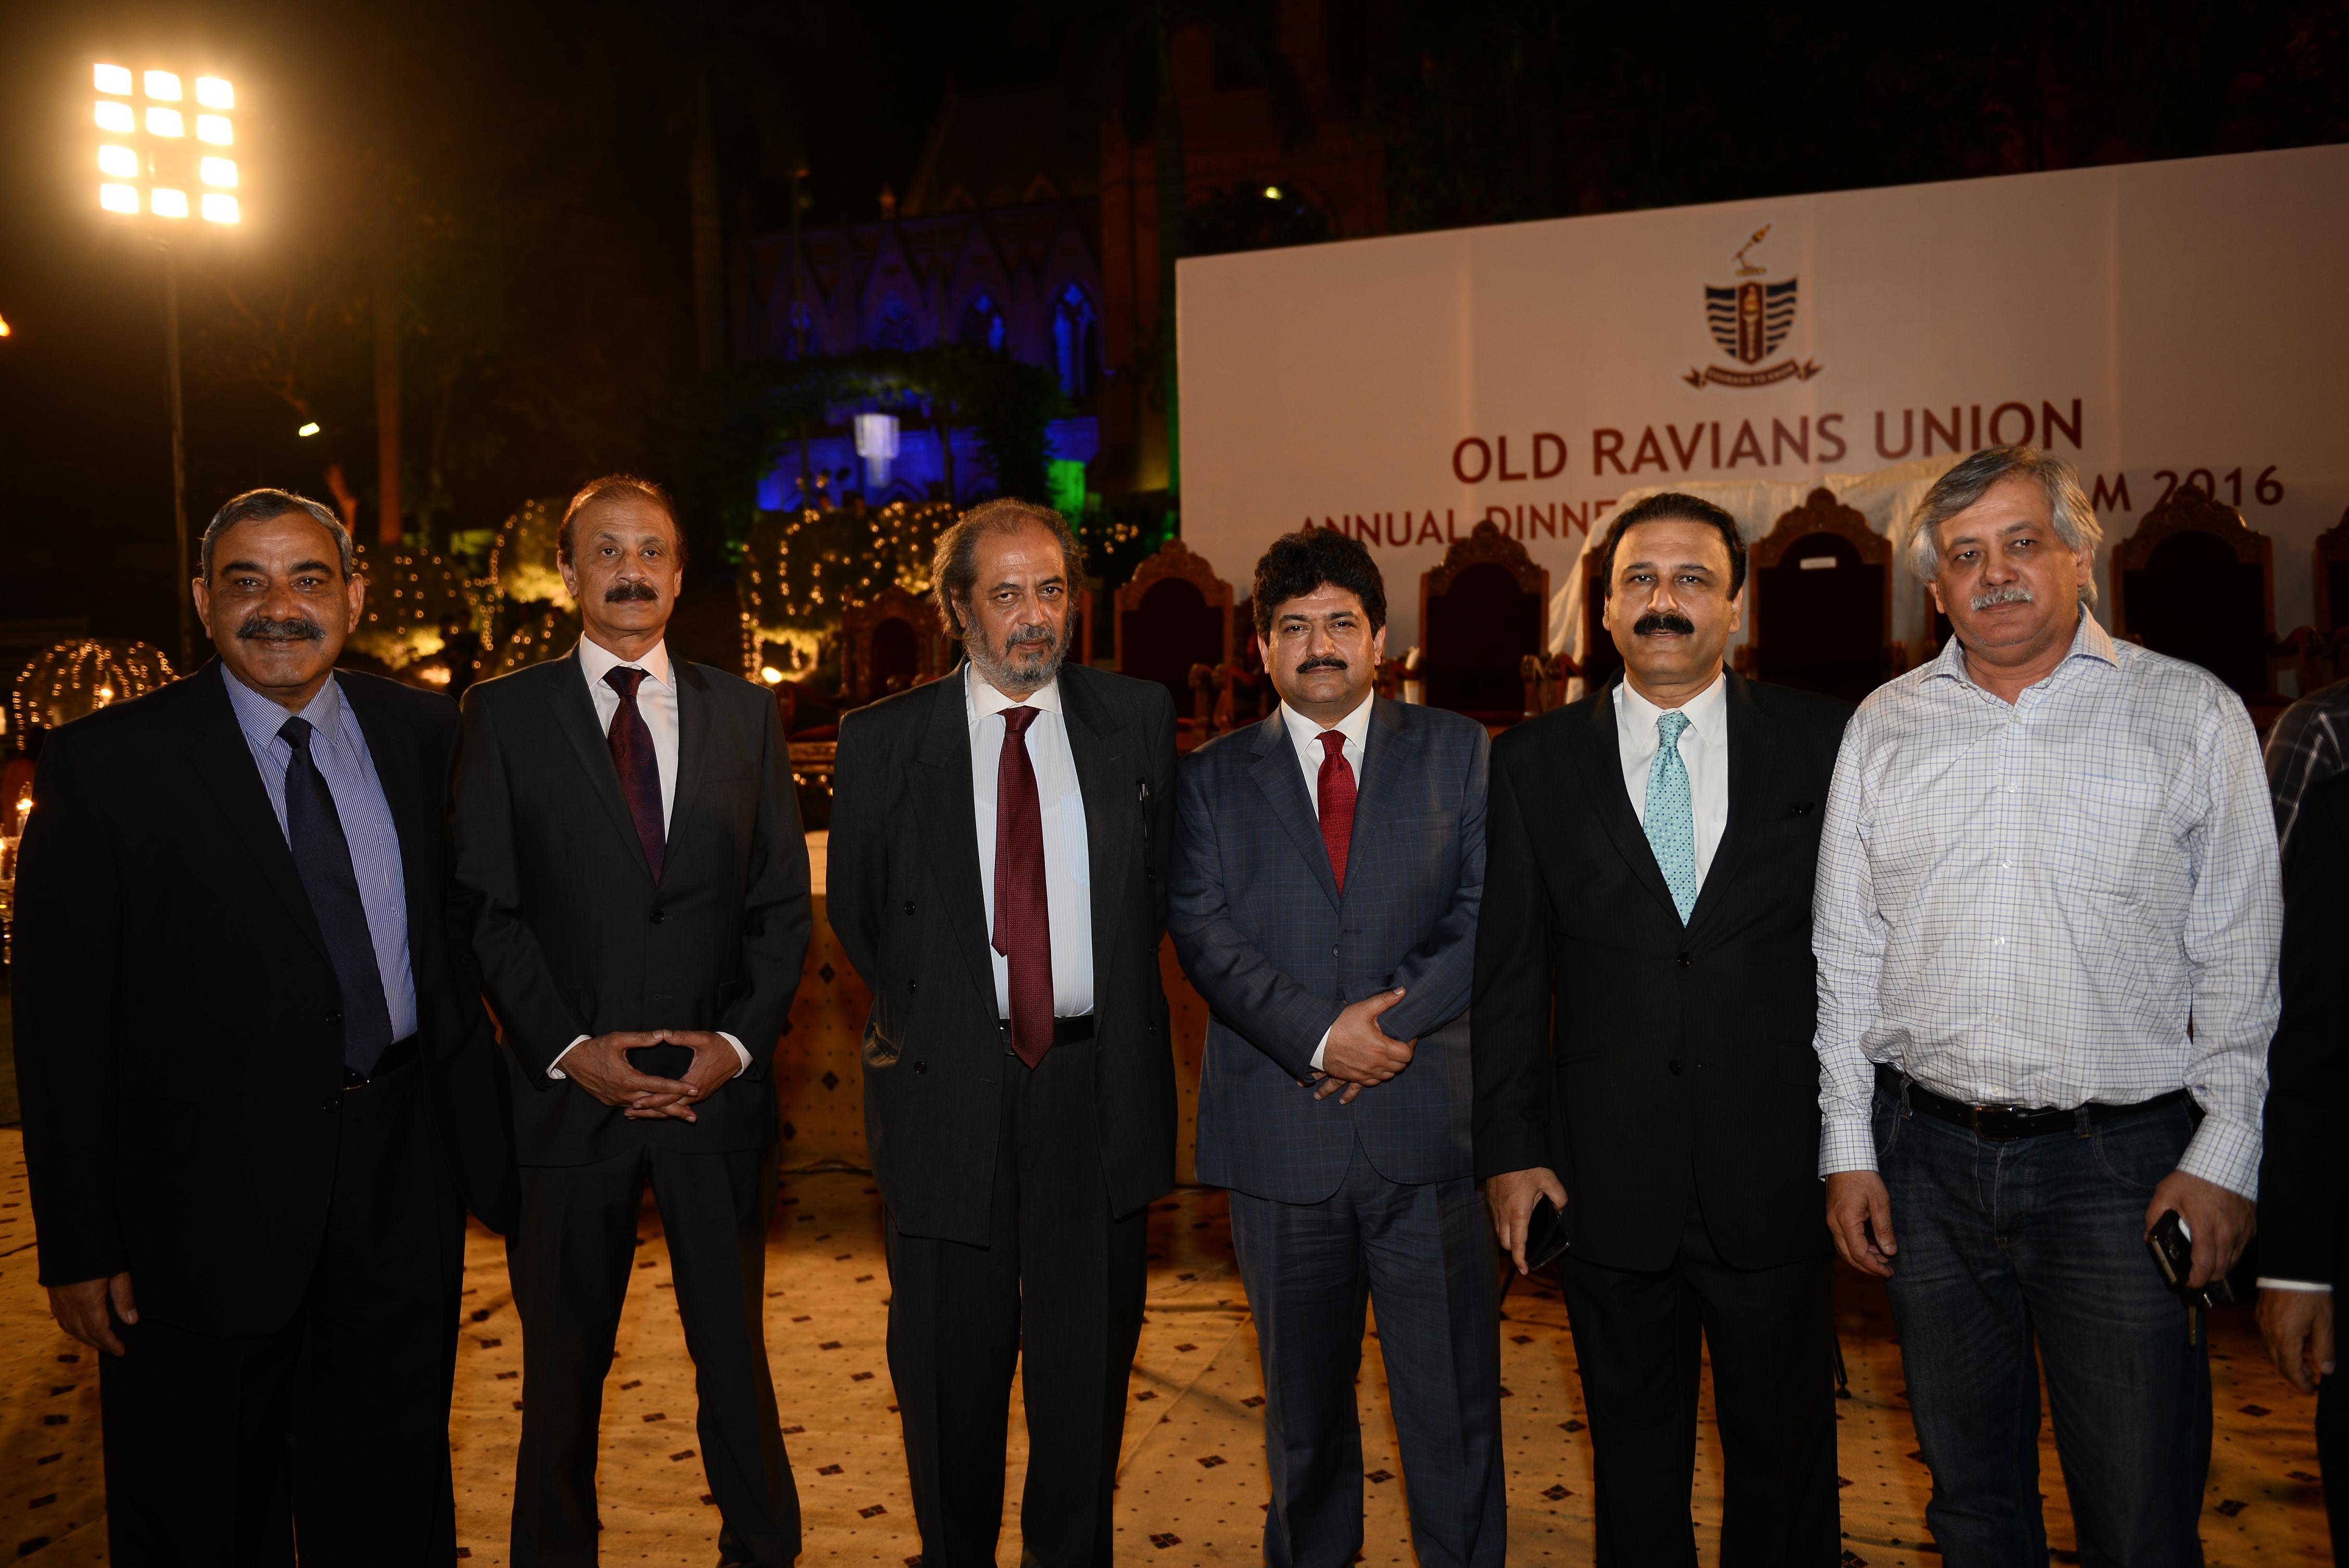 Mr. Lashari, Dr. Shah, Hamid Mir & Dr. Butt